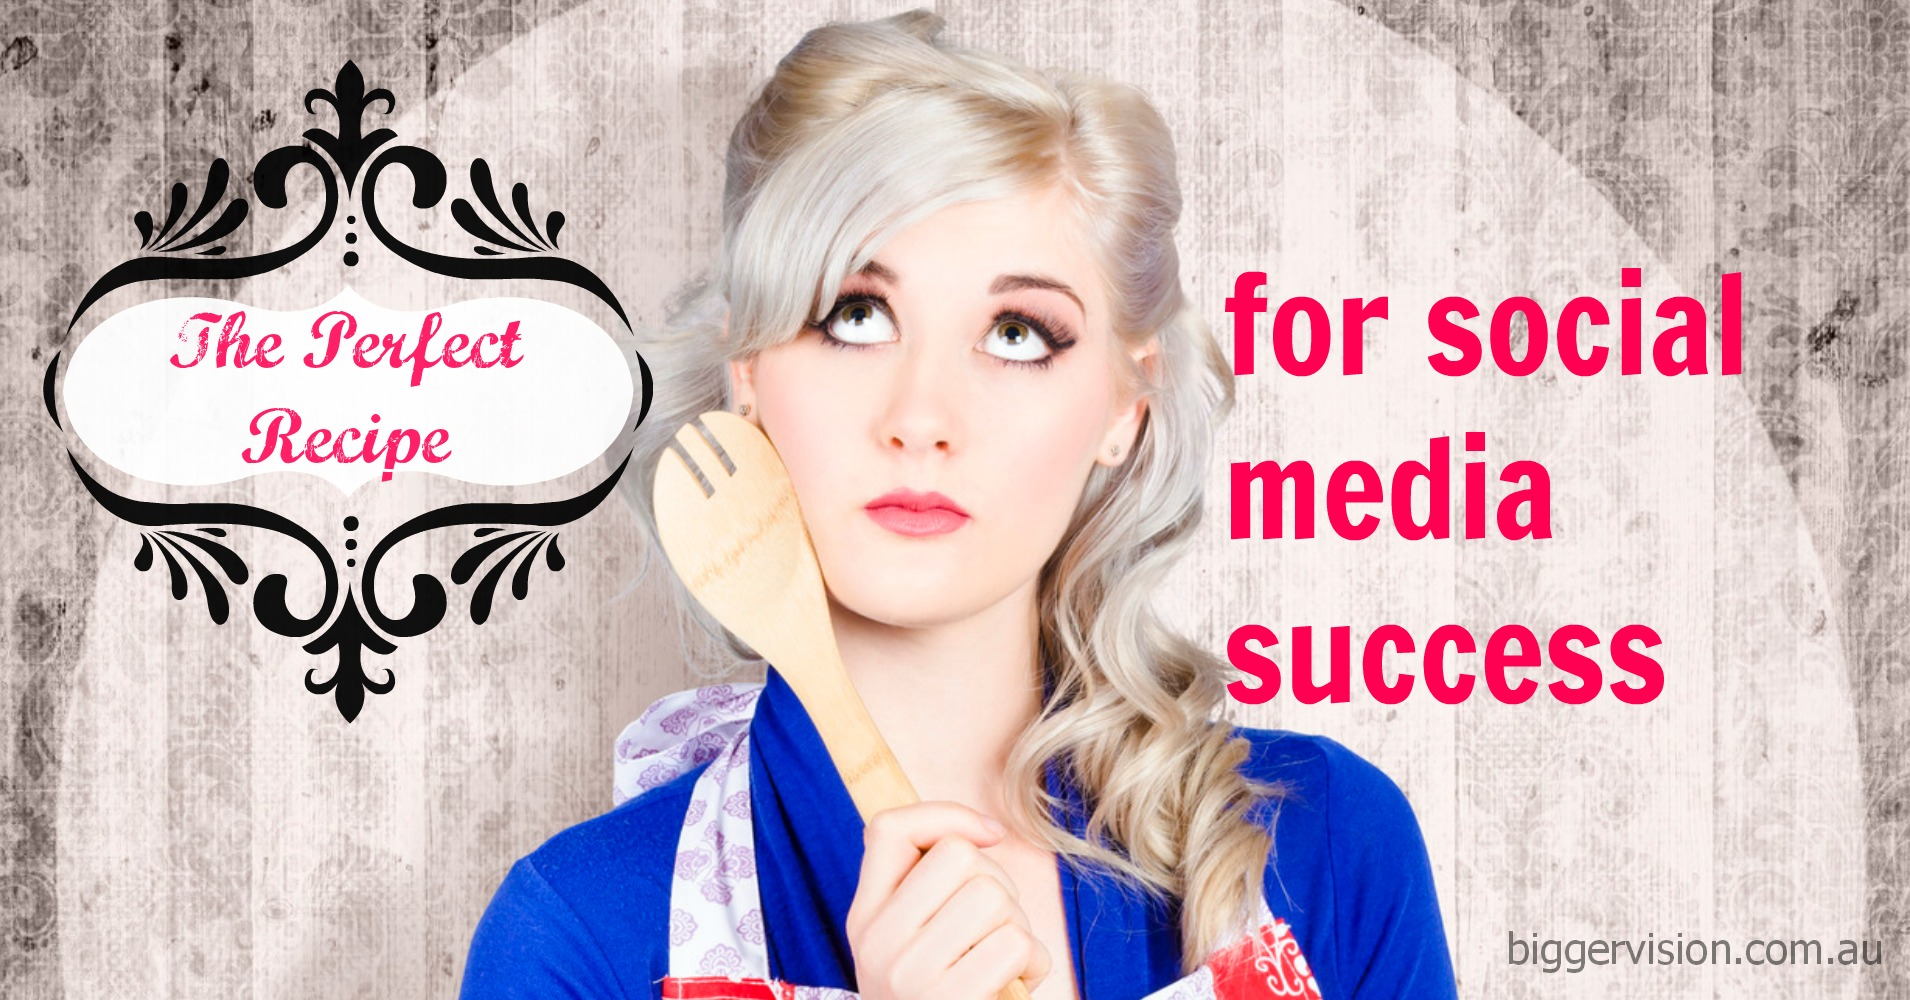 Images for social media marketing